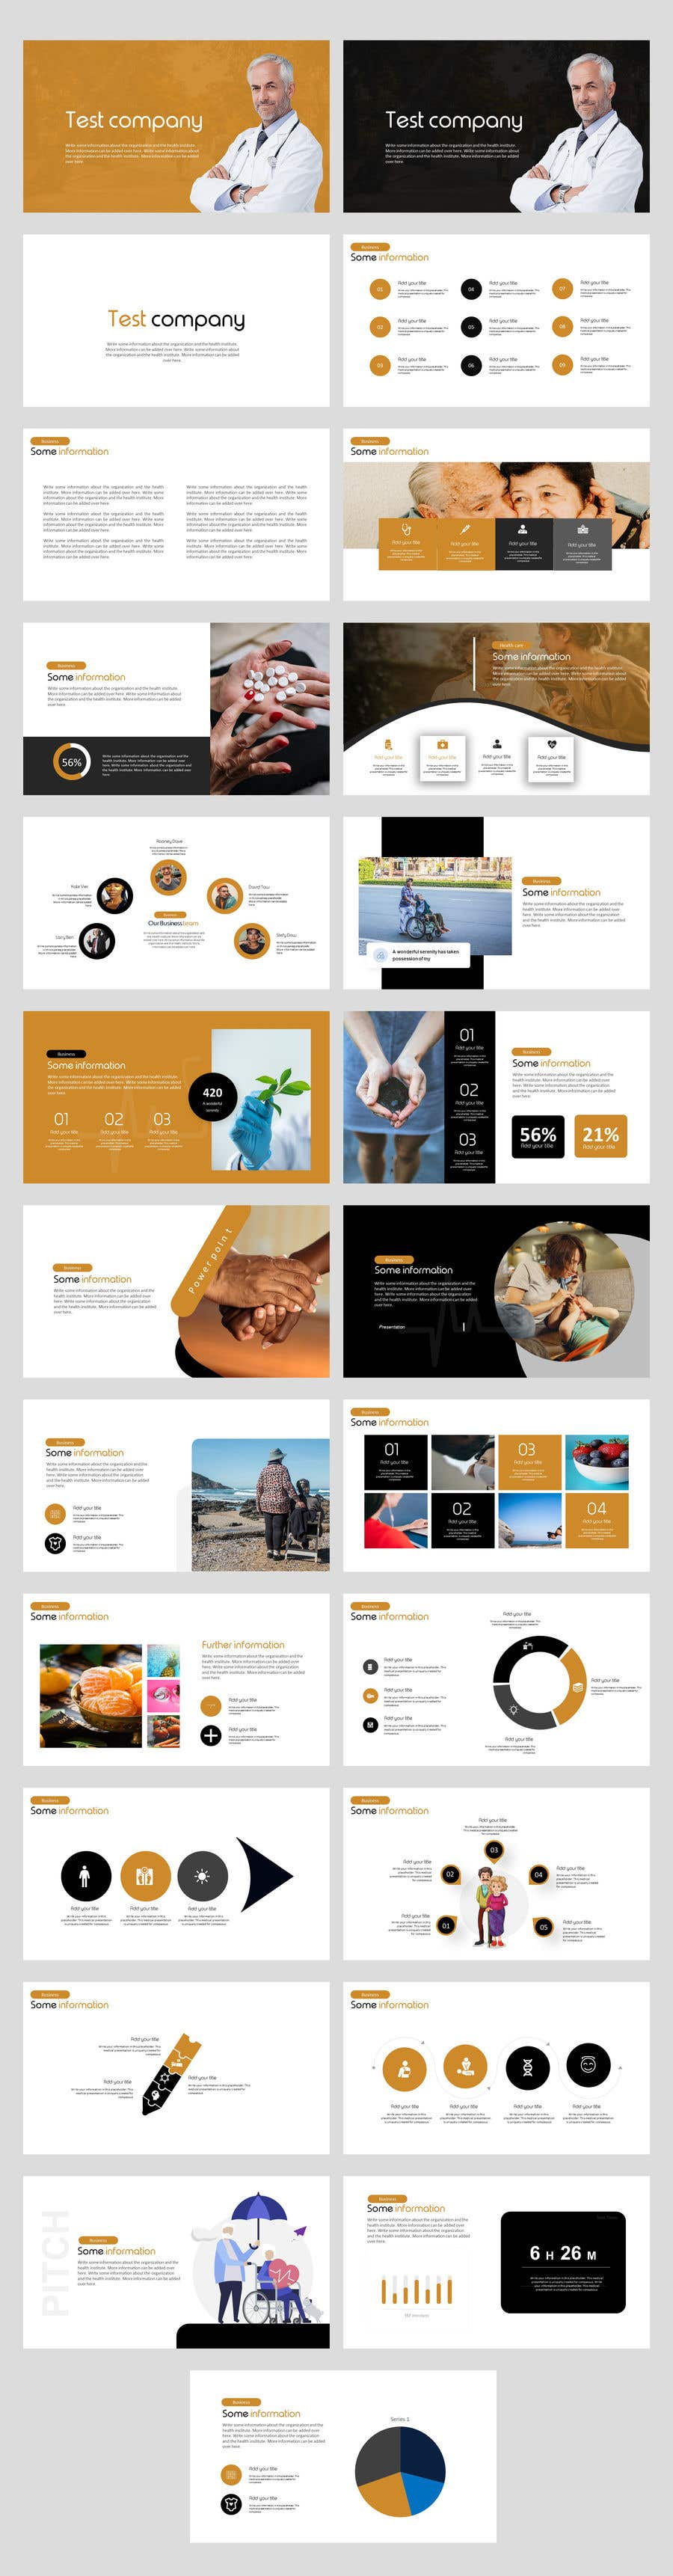 Penyertaan Peraduan #                                        7                                      untuk                                         Design a Custom PowerPoint Template